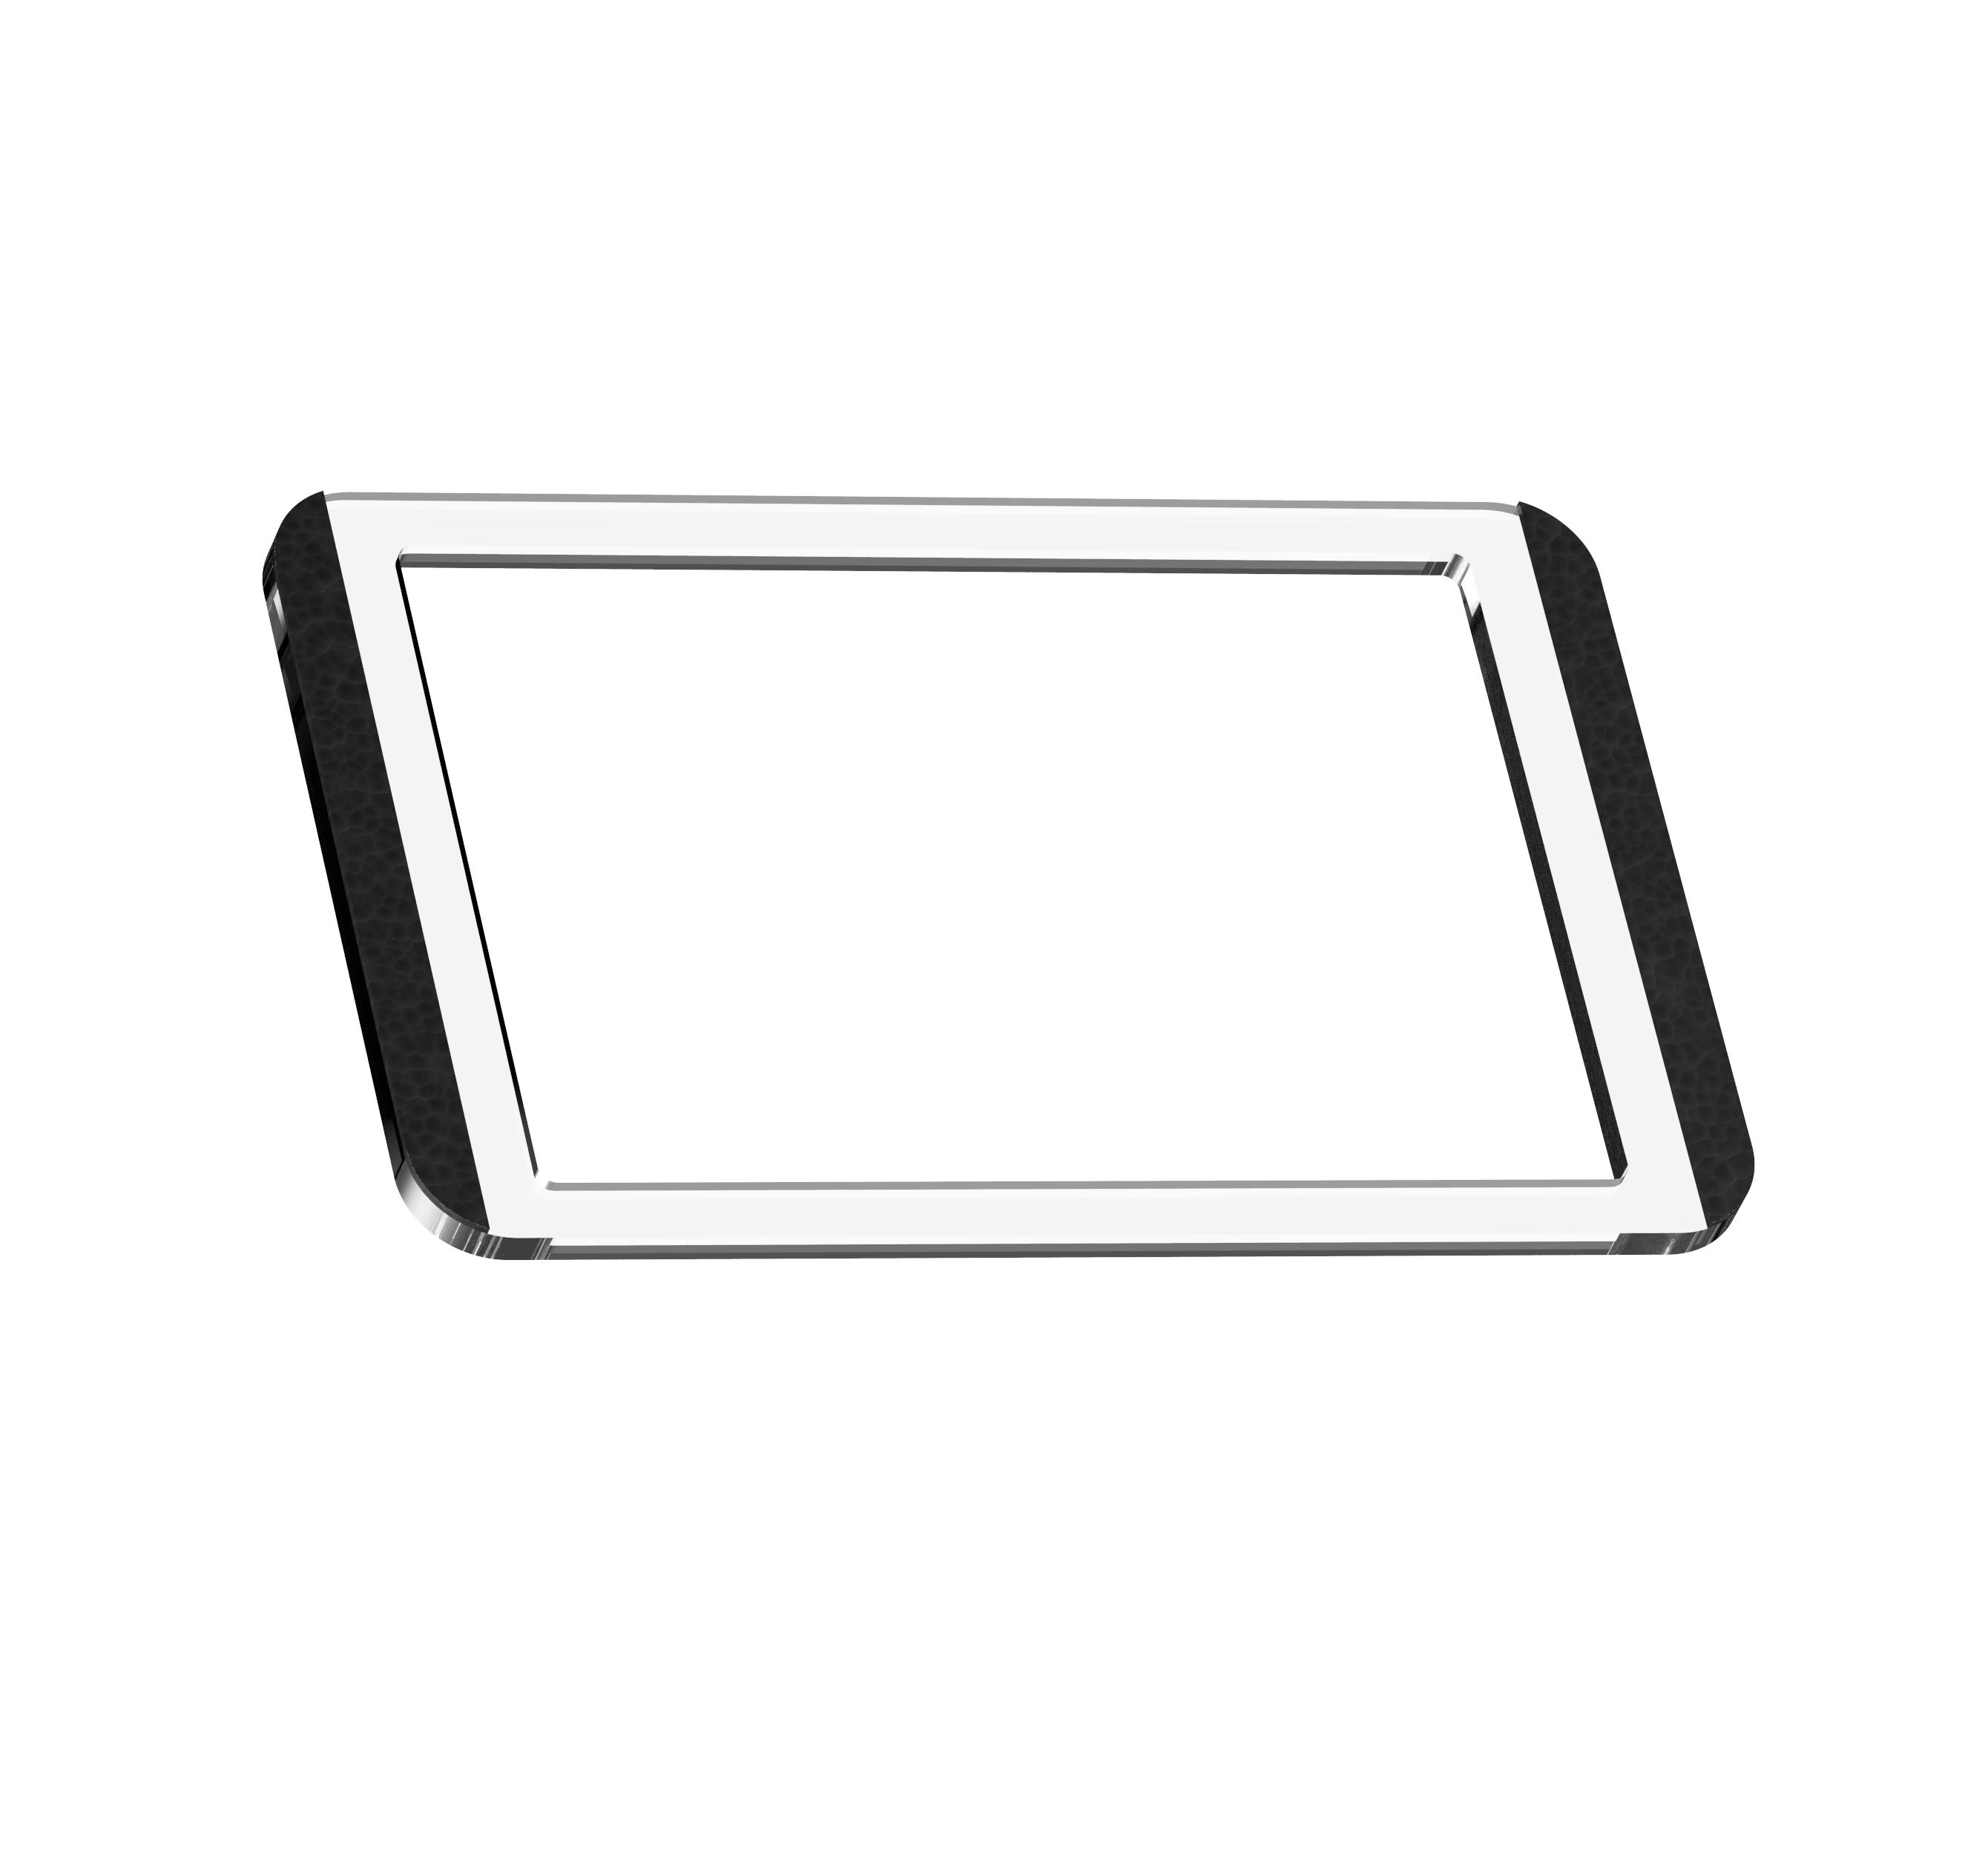 FB02202_MAIN_Plate-Holder.jpg